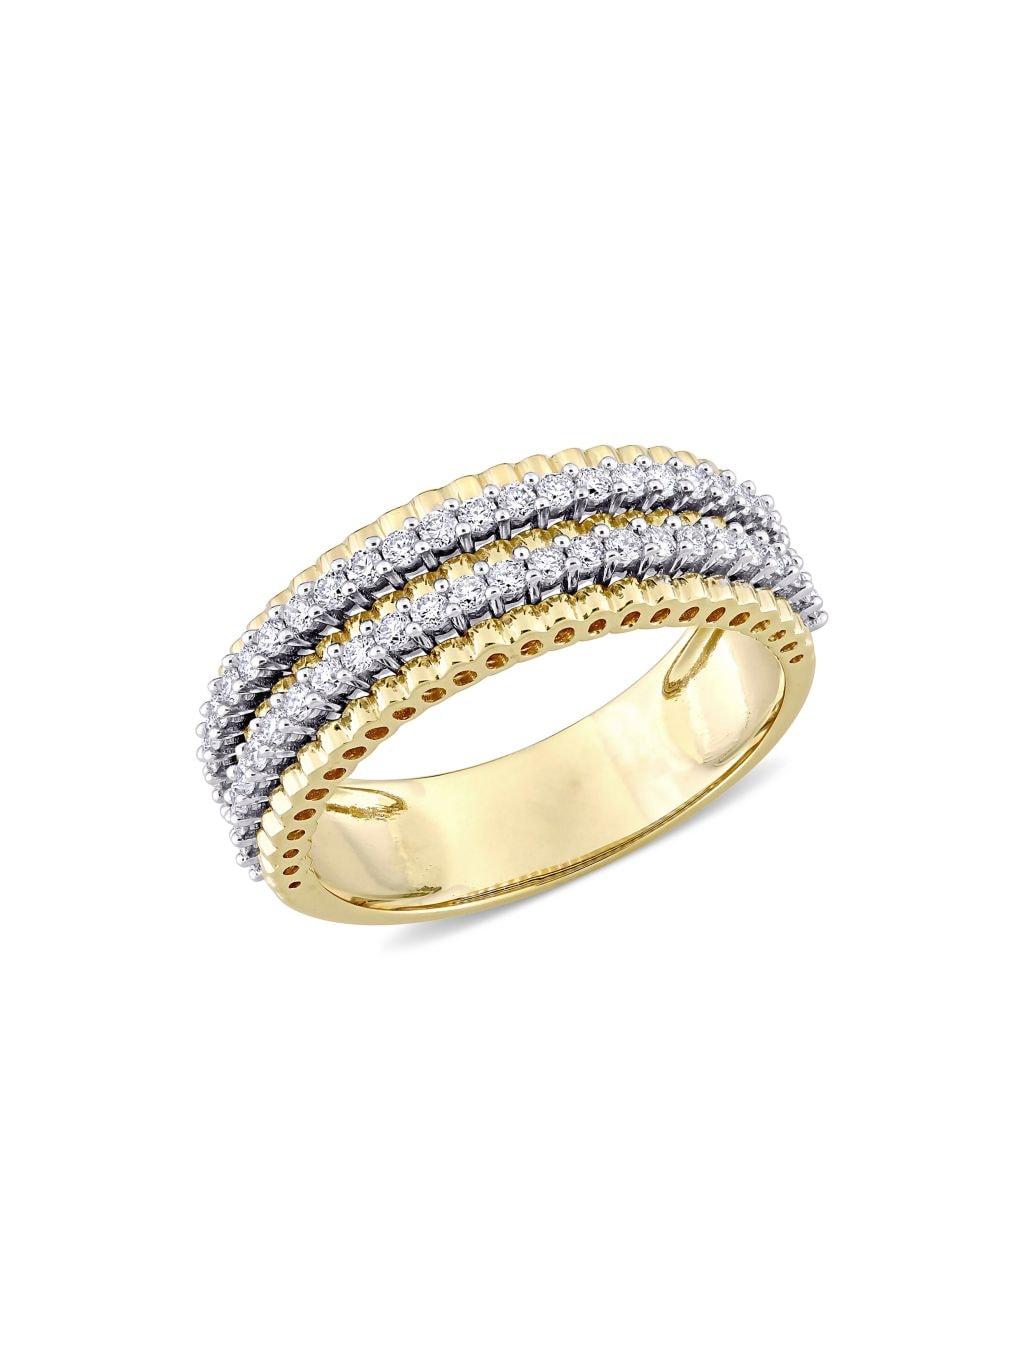 Saks Fifth Avenue 14K Two-Tone Gold & White Diamond Anniversary Ring